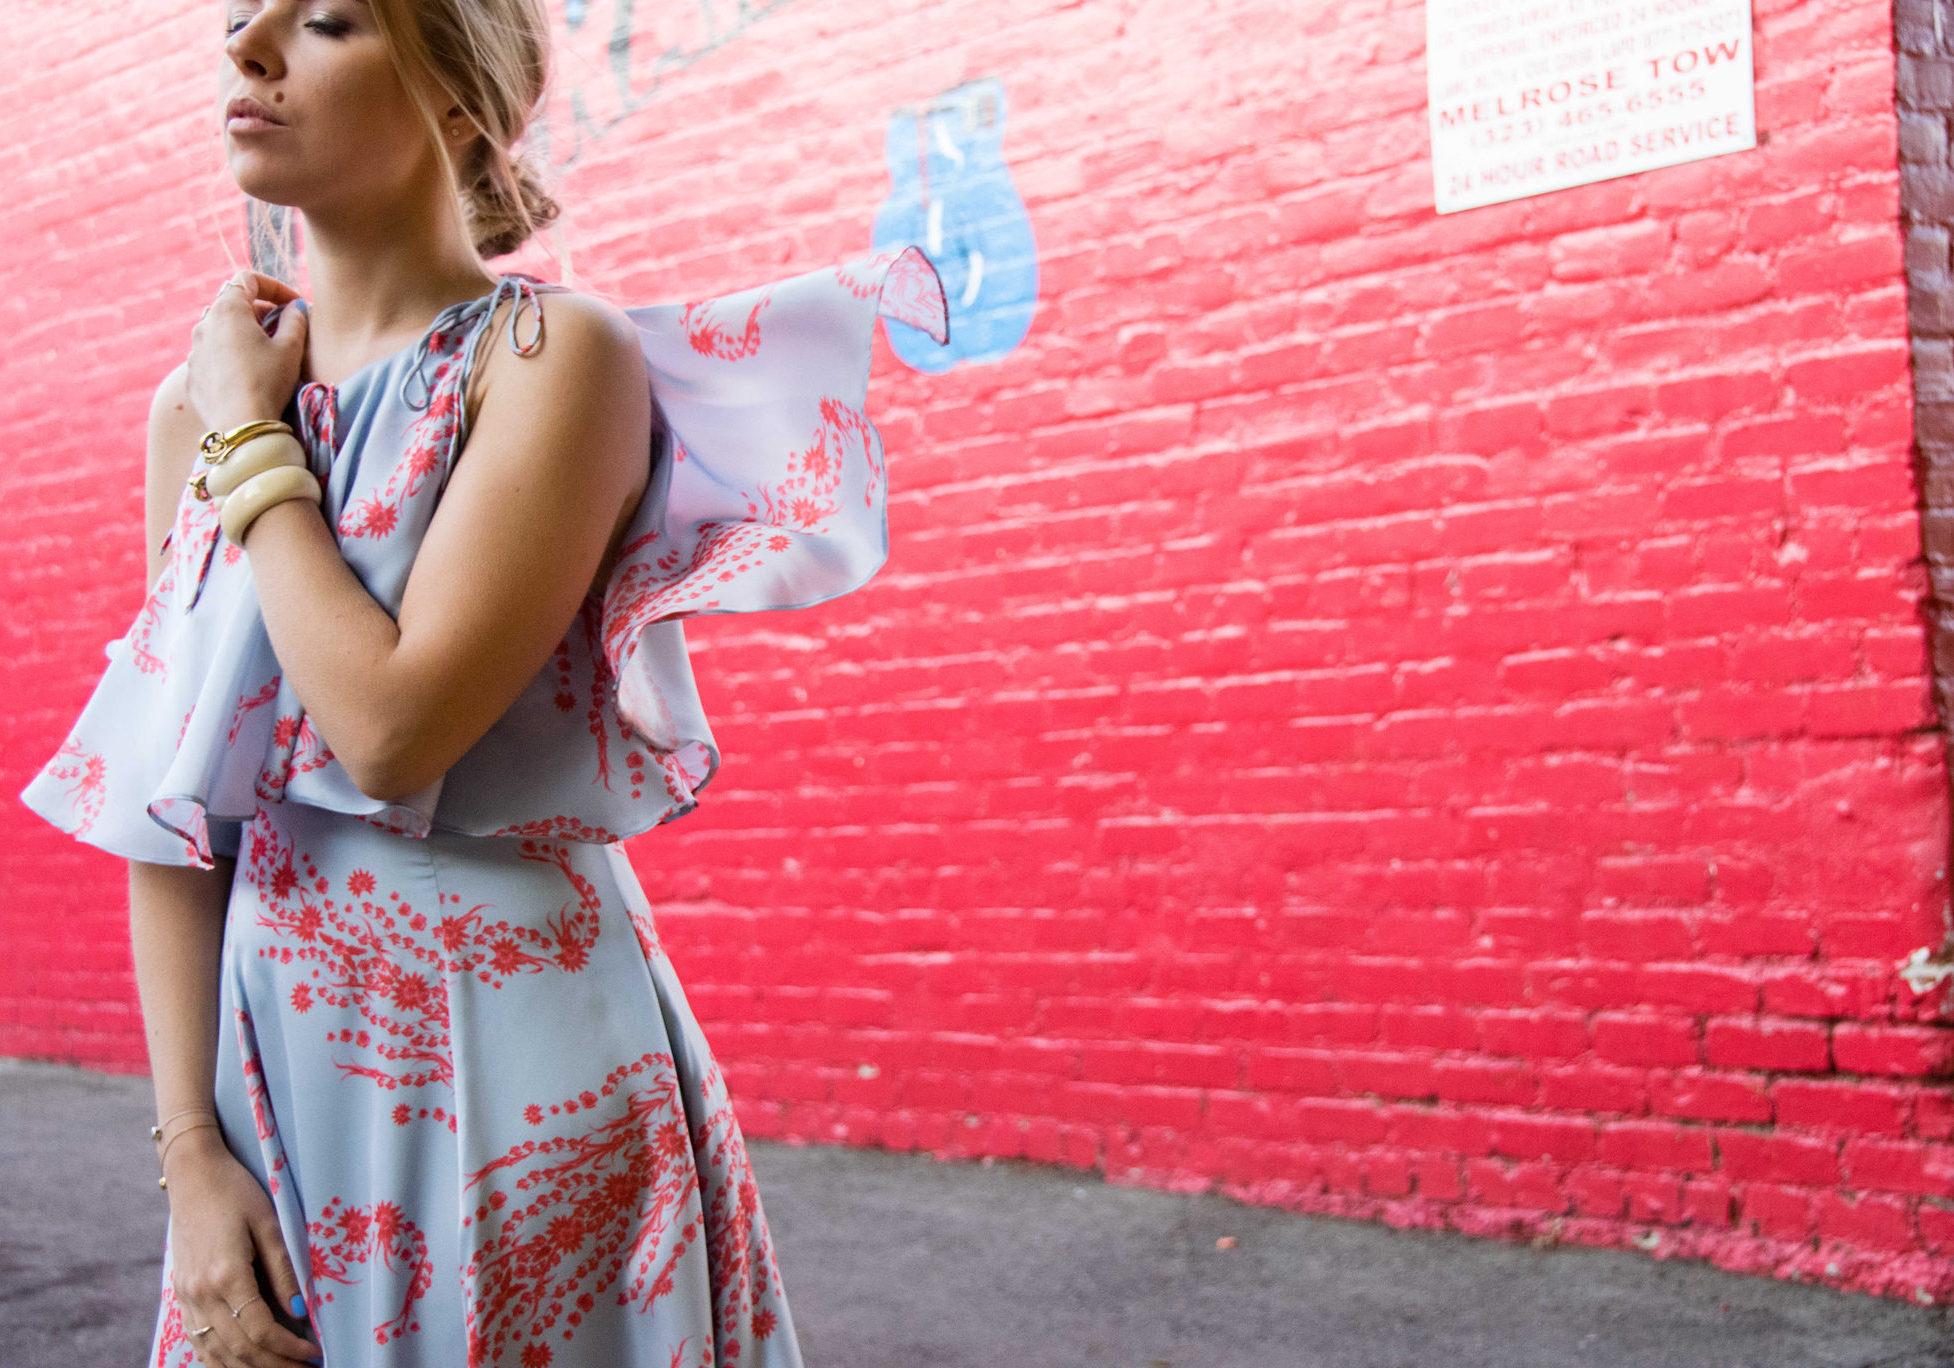 Cynthia Rowley Women's Midi Dress with Popover Detail - Olga Pancenko - aestheticallypleasing - Femminine and Edgy Style